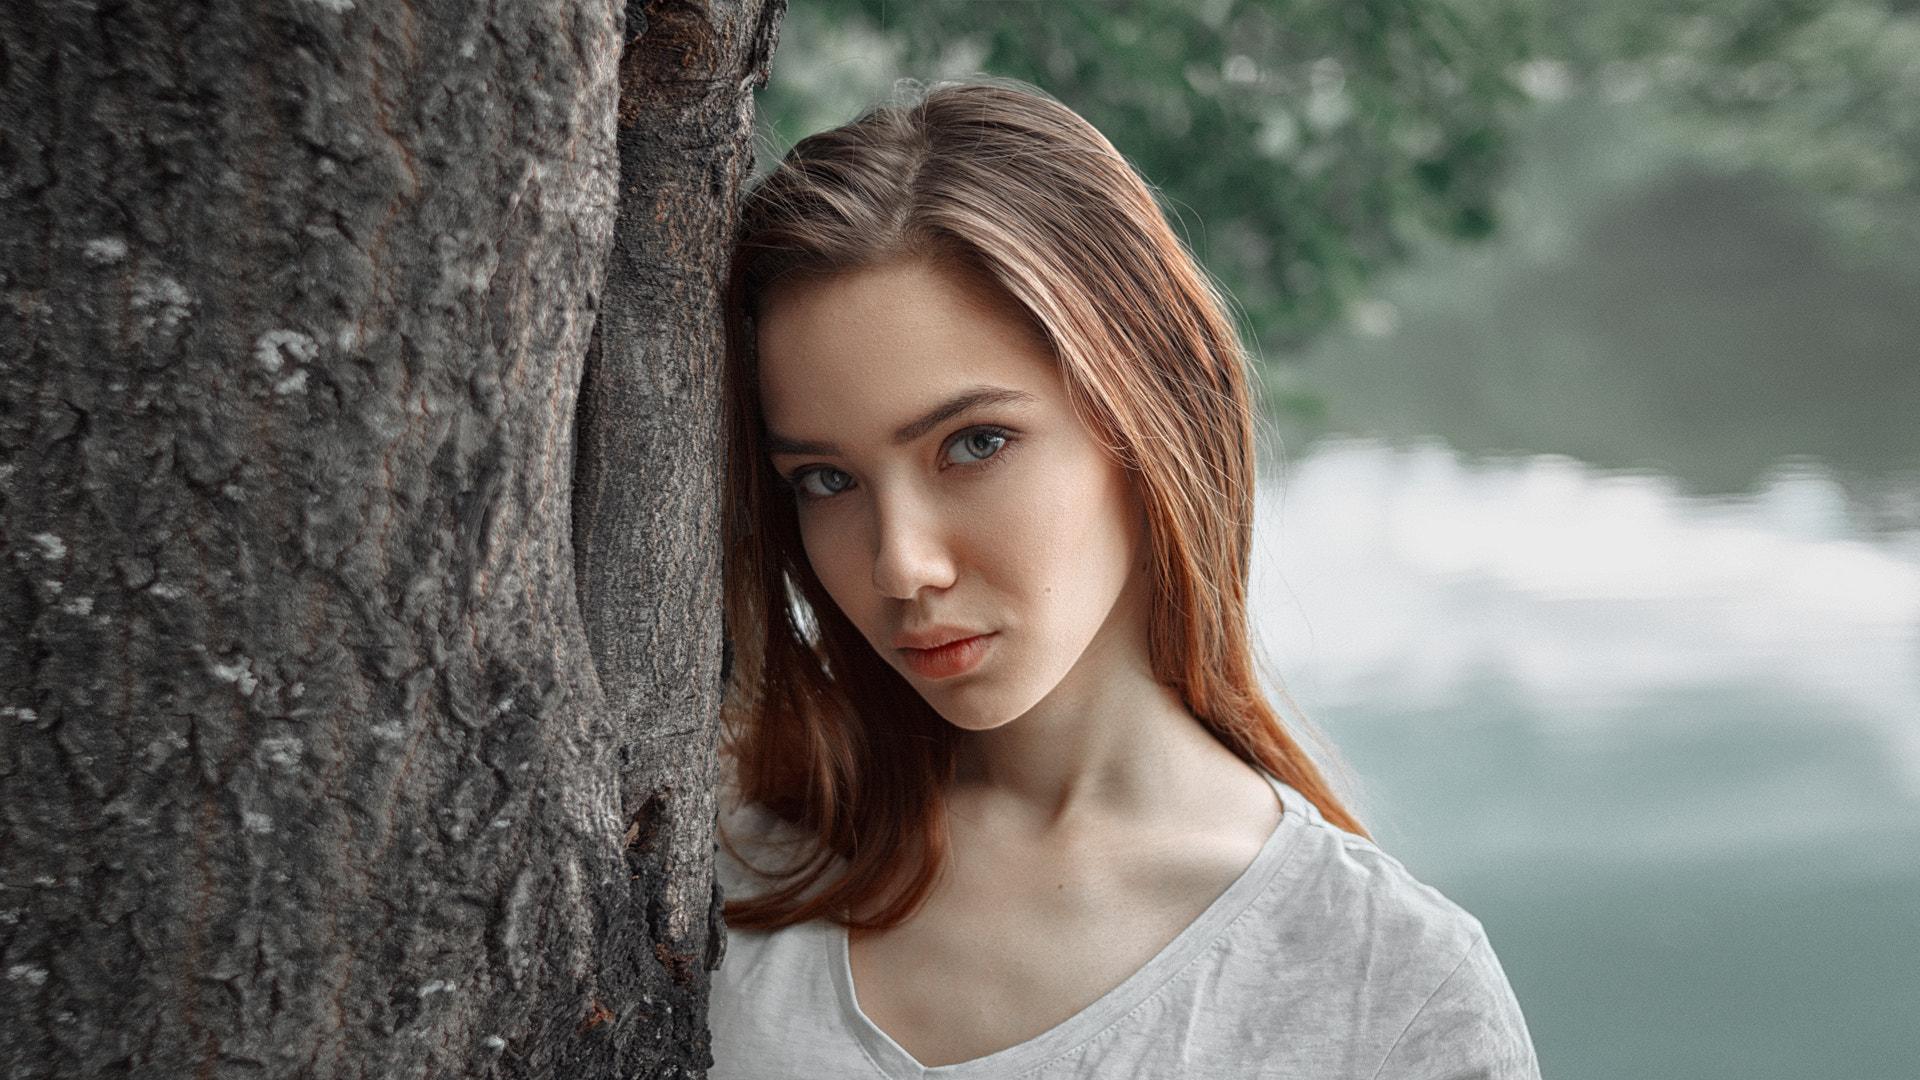 Девушка в лесу картинки без обработки